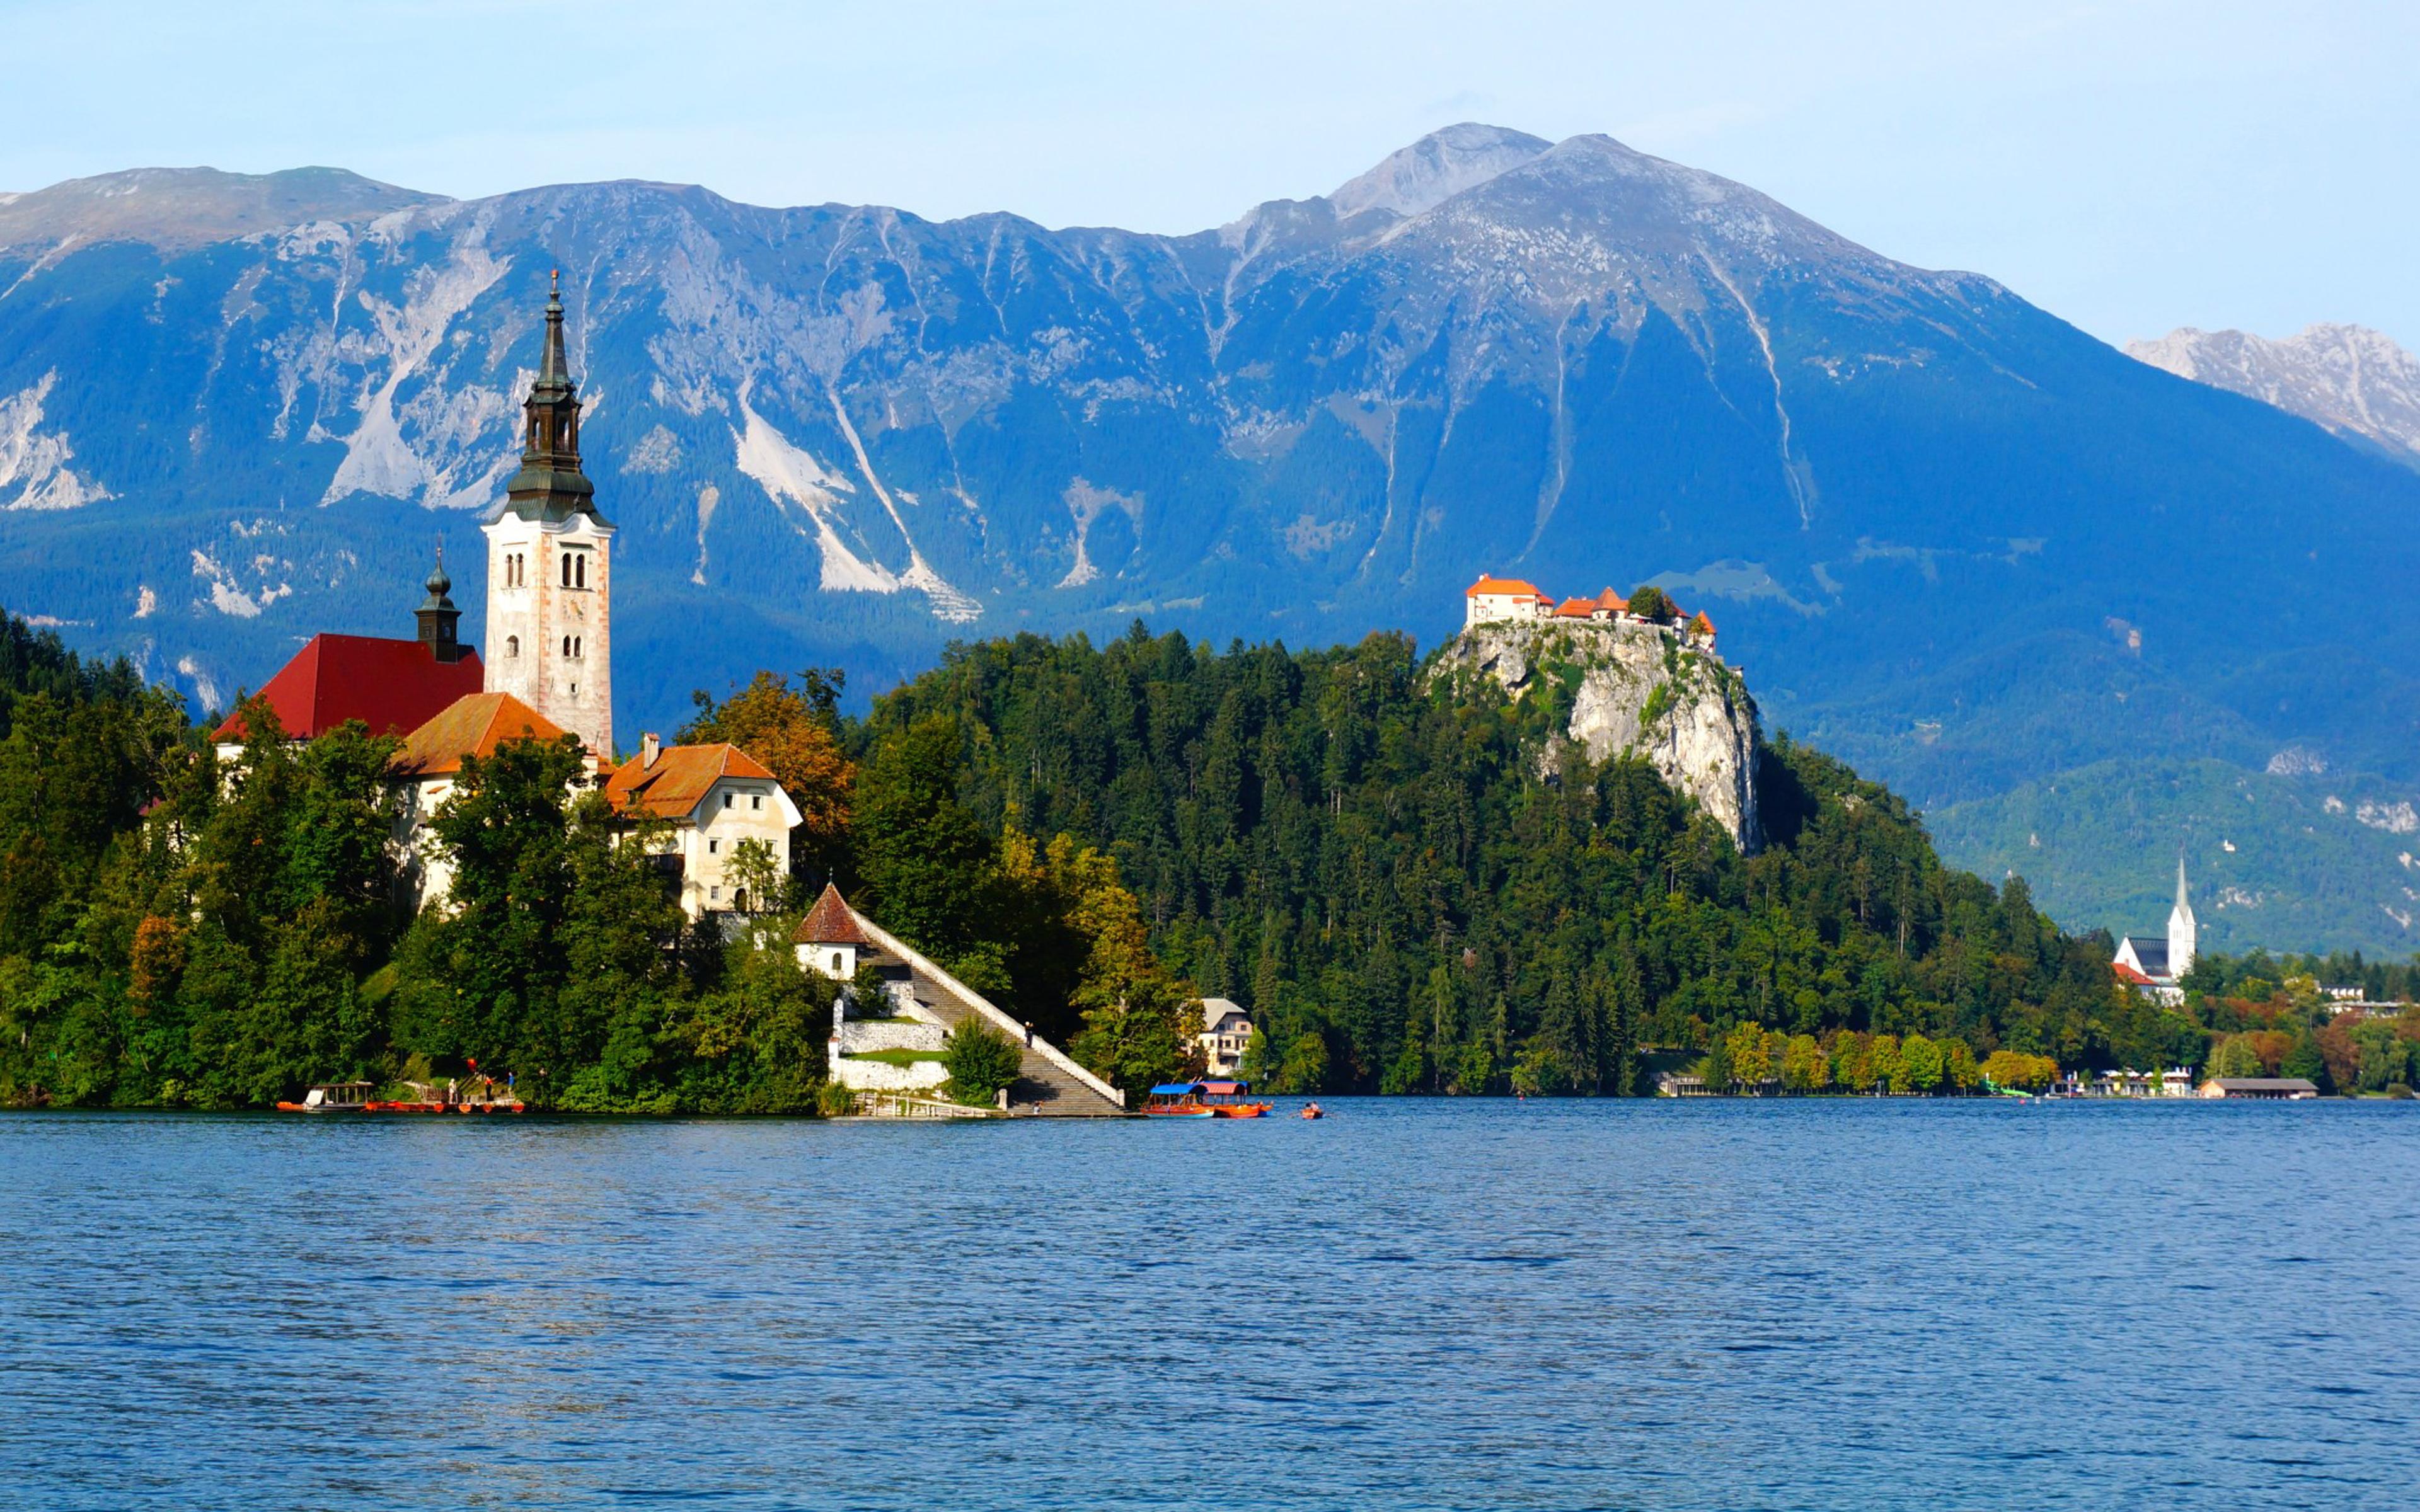 Spring Wallpaper Iphone 4 Lake Bled Slovenia Wallpaper Hd 0974 Wallpapers13 Com